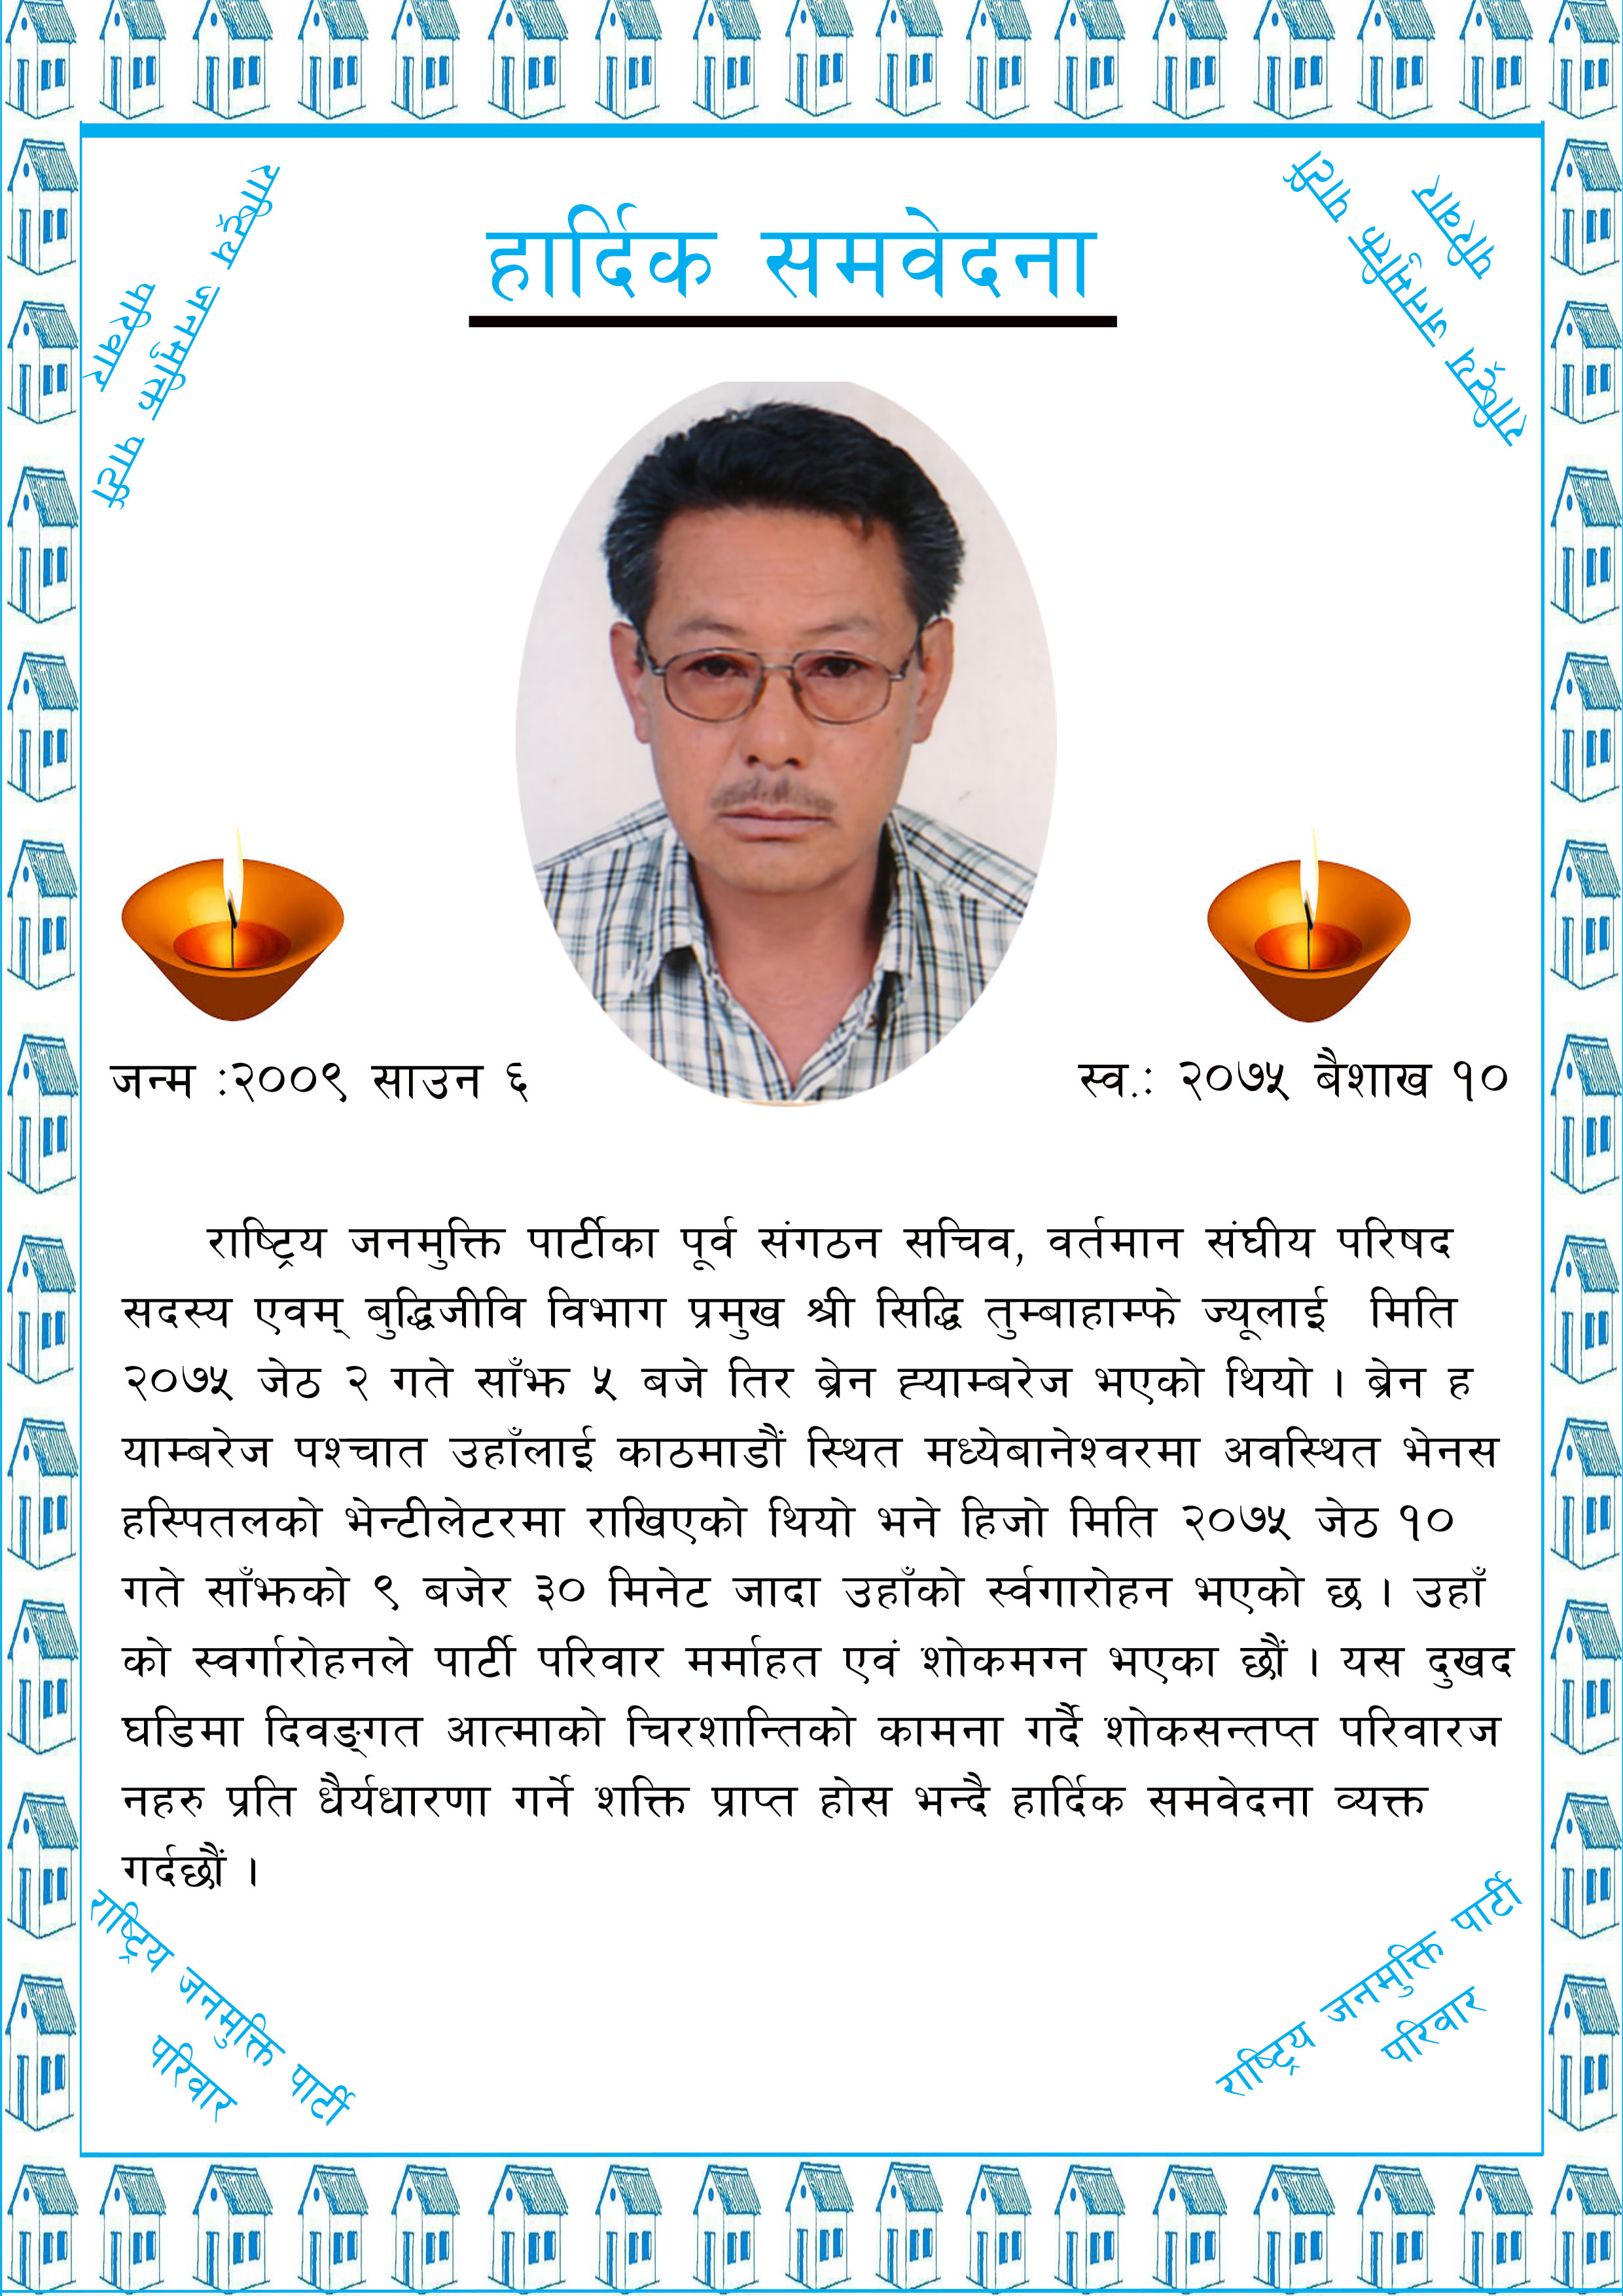 http://janamukti.org/wp-content/uploads/2018/05/Condolence-of-siddhi.jpg